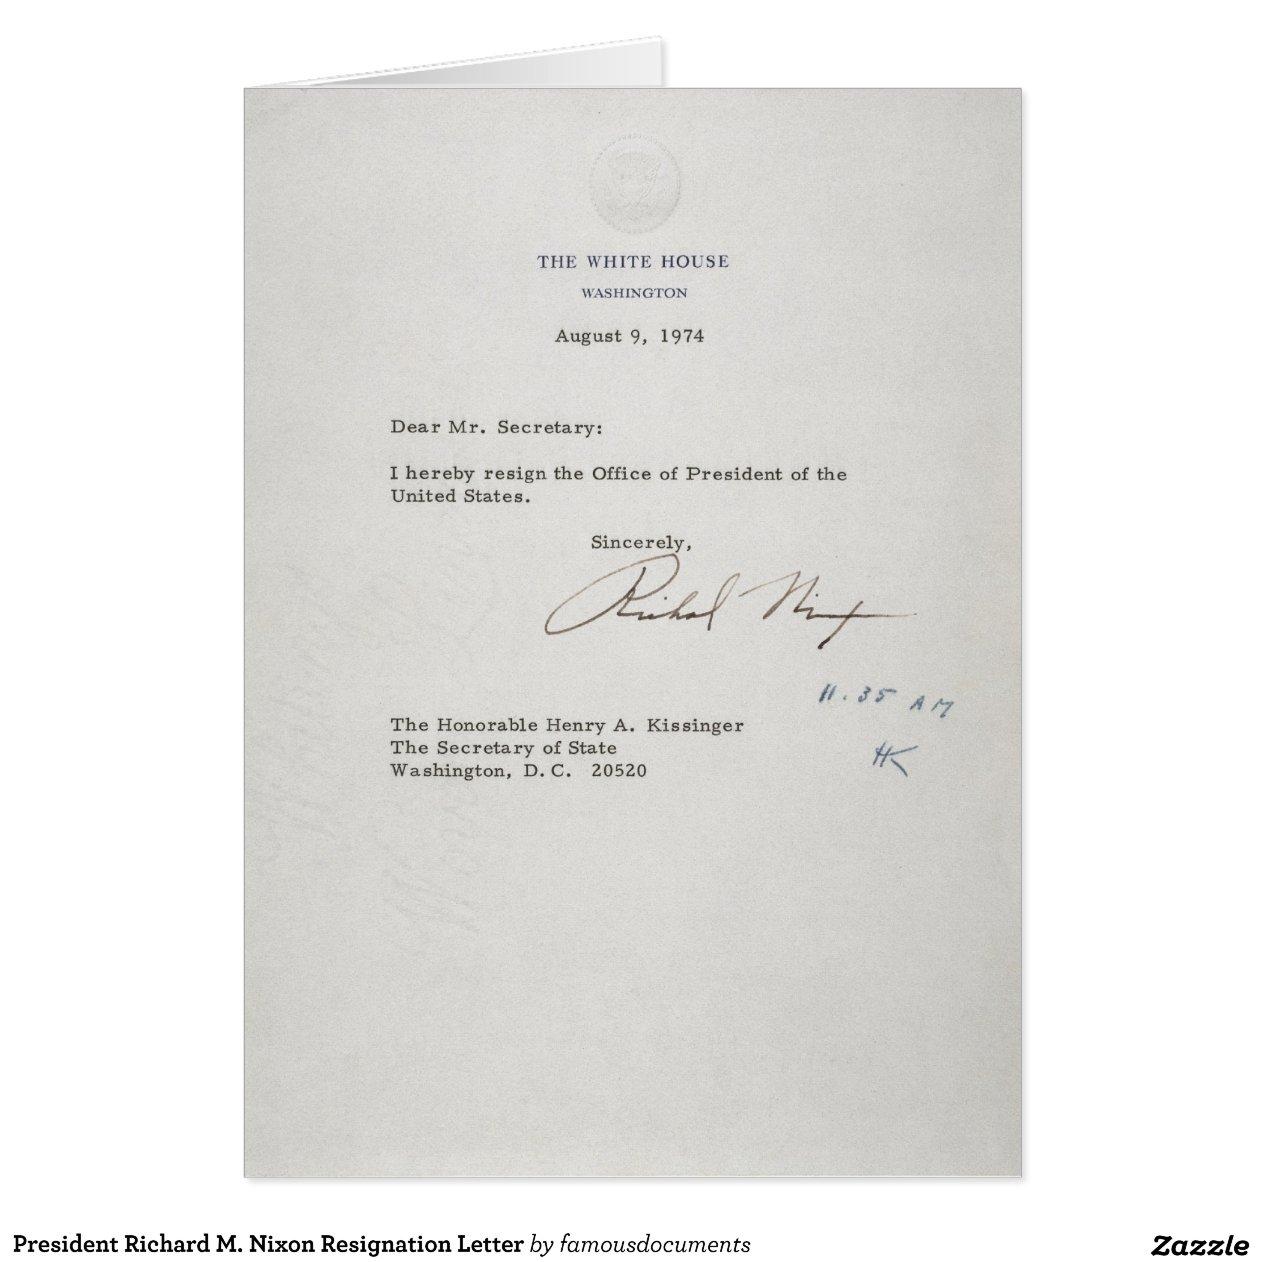 Richard Nixon Resignation Letter Peopledavidjoelco Writing A Essay